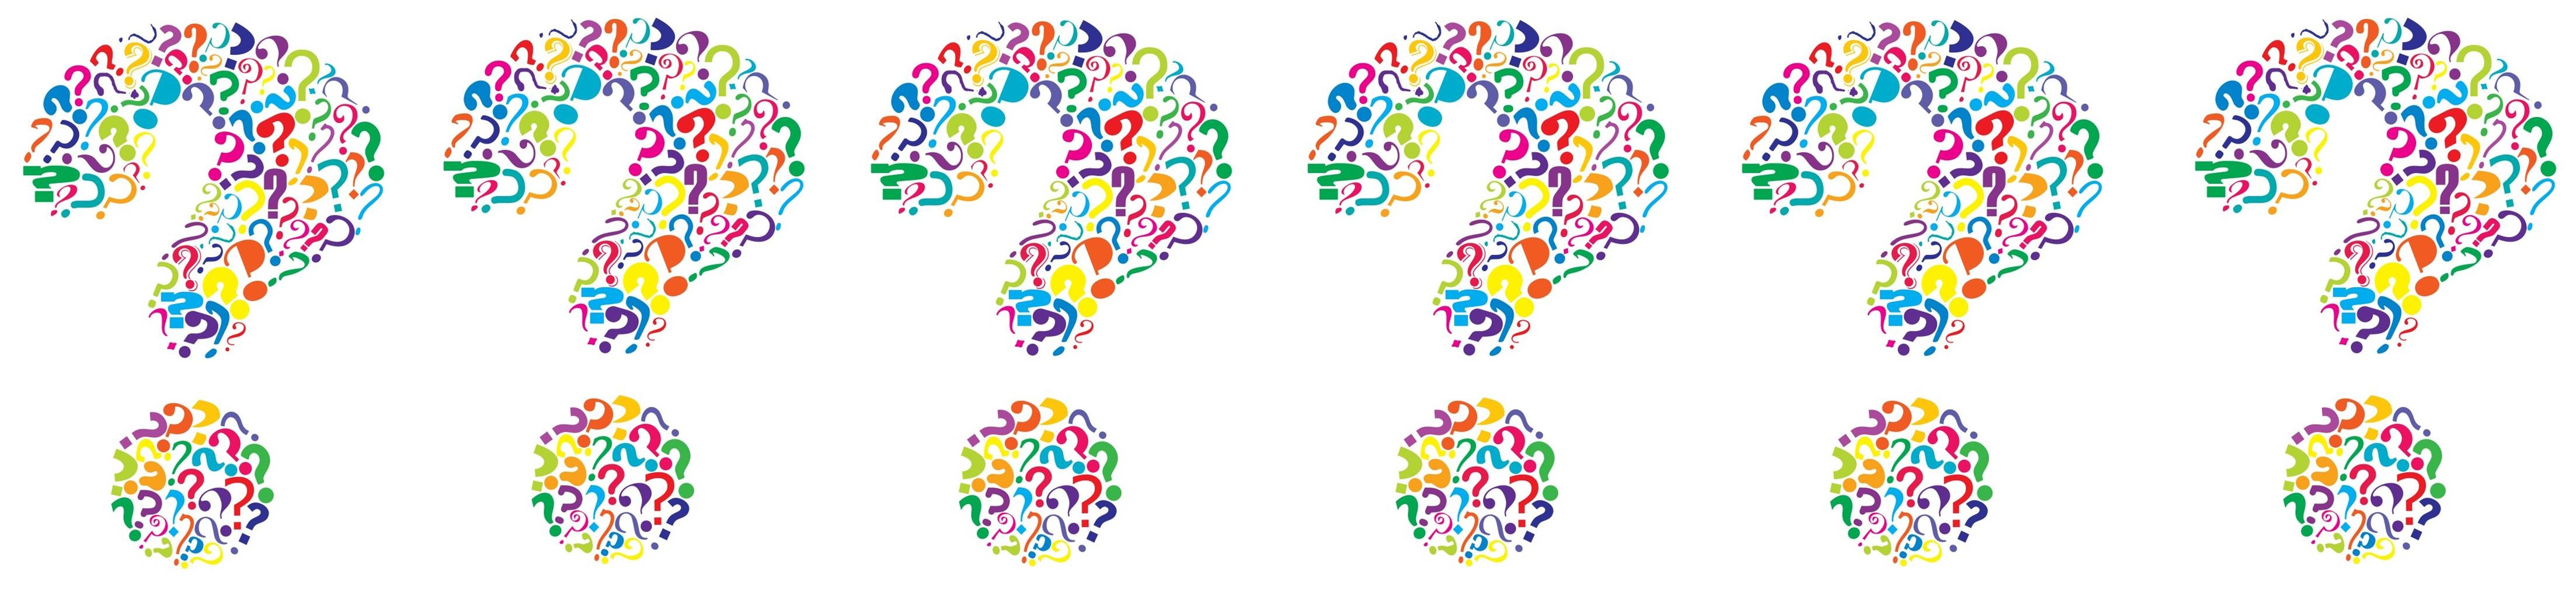 quiz-question-marks